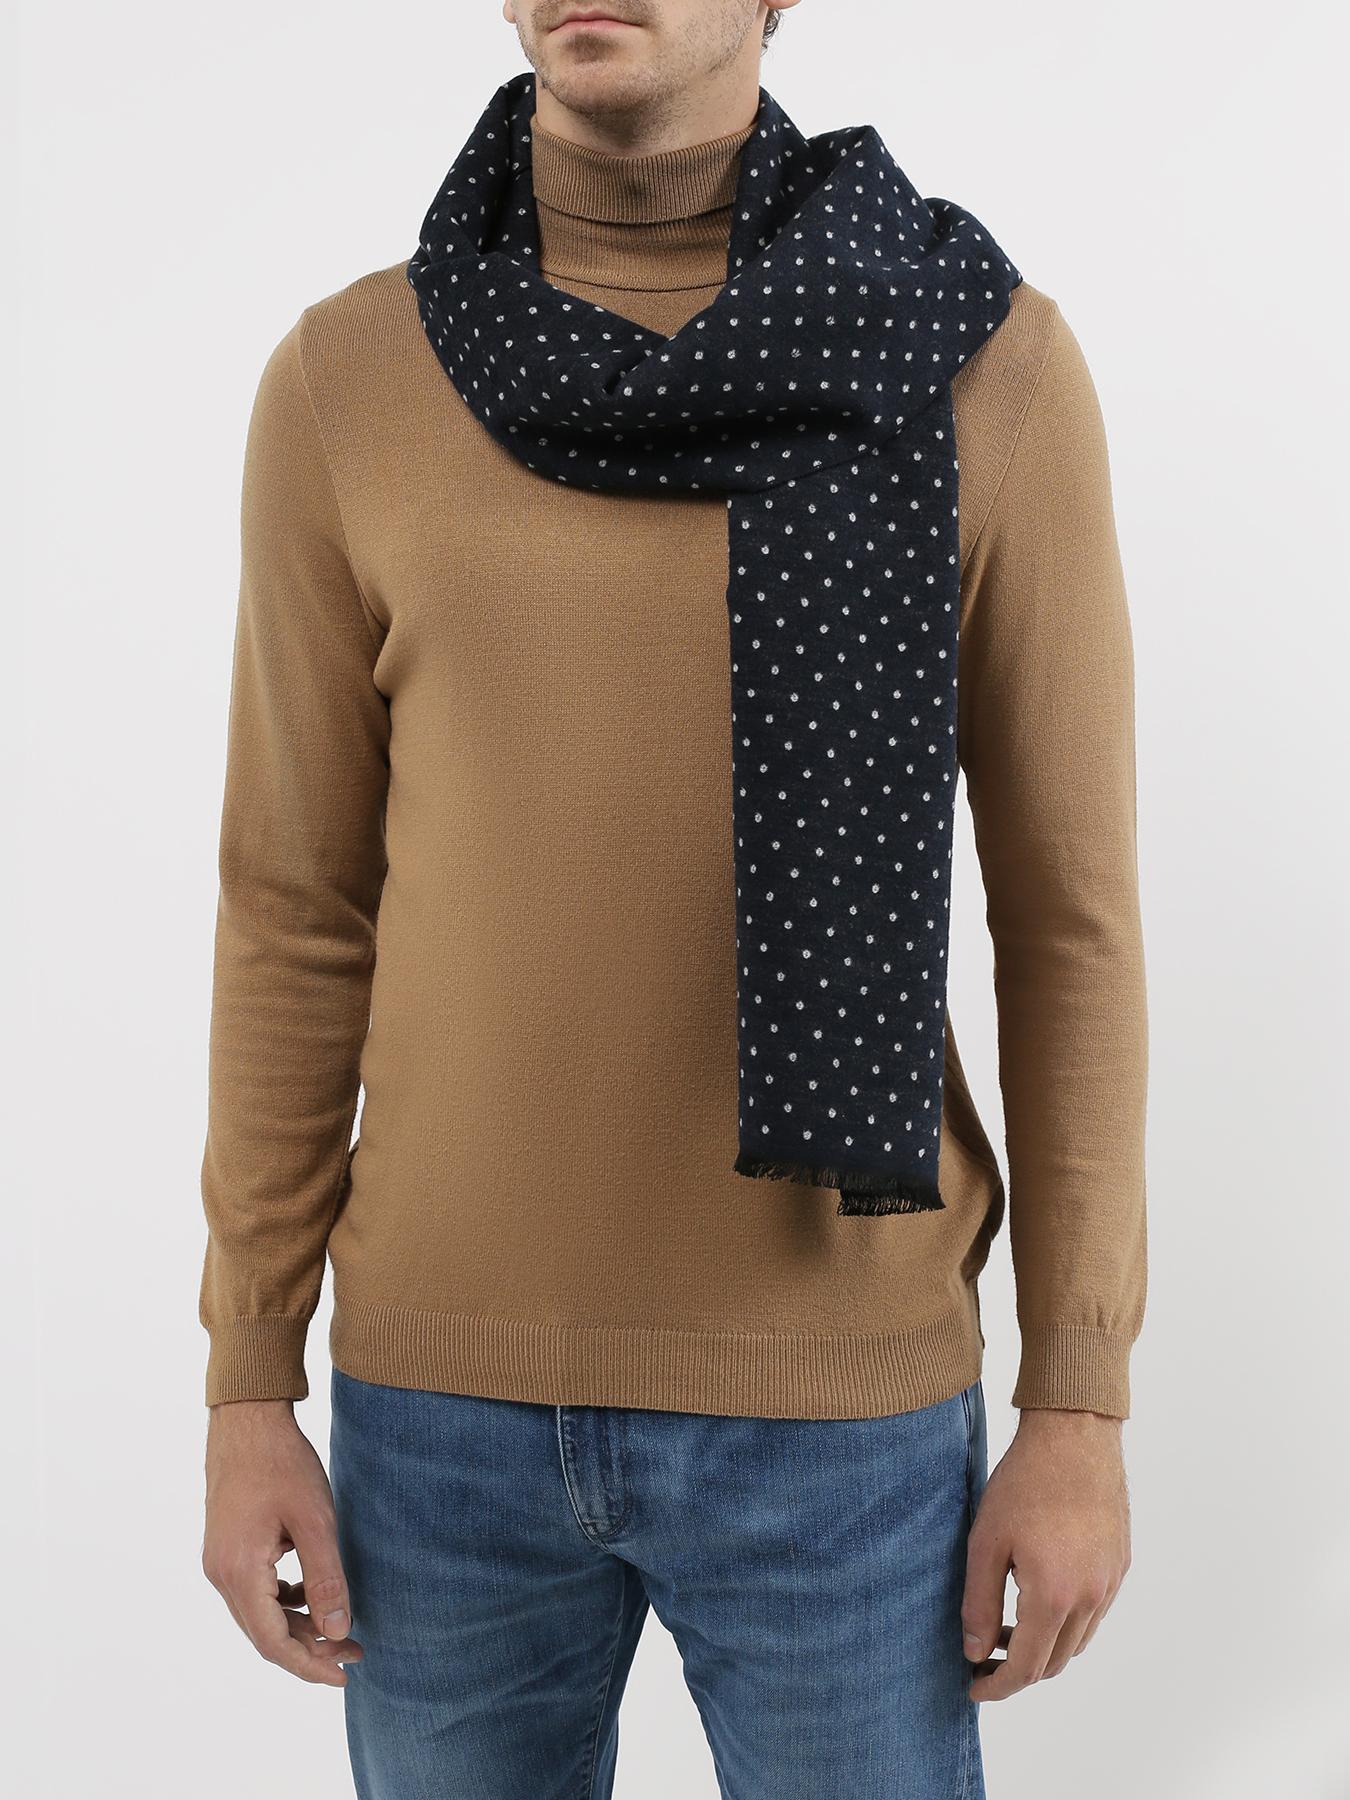 Шарф Alessandro Manzoni Jeans Мужской шарф в горох